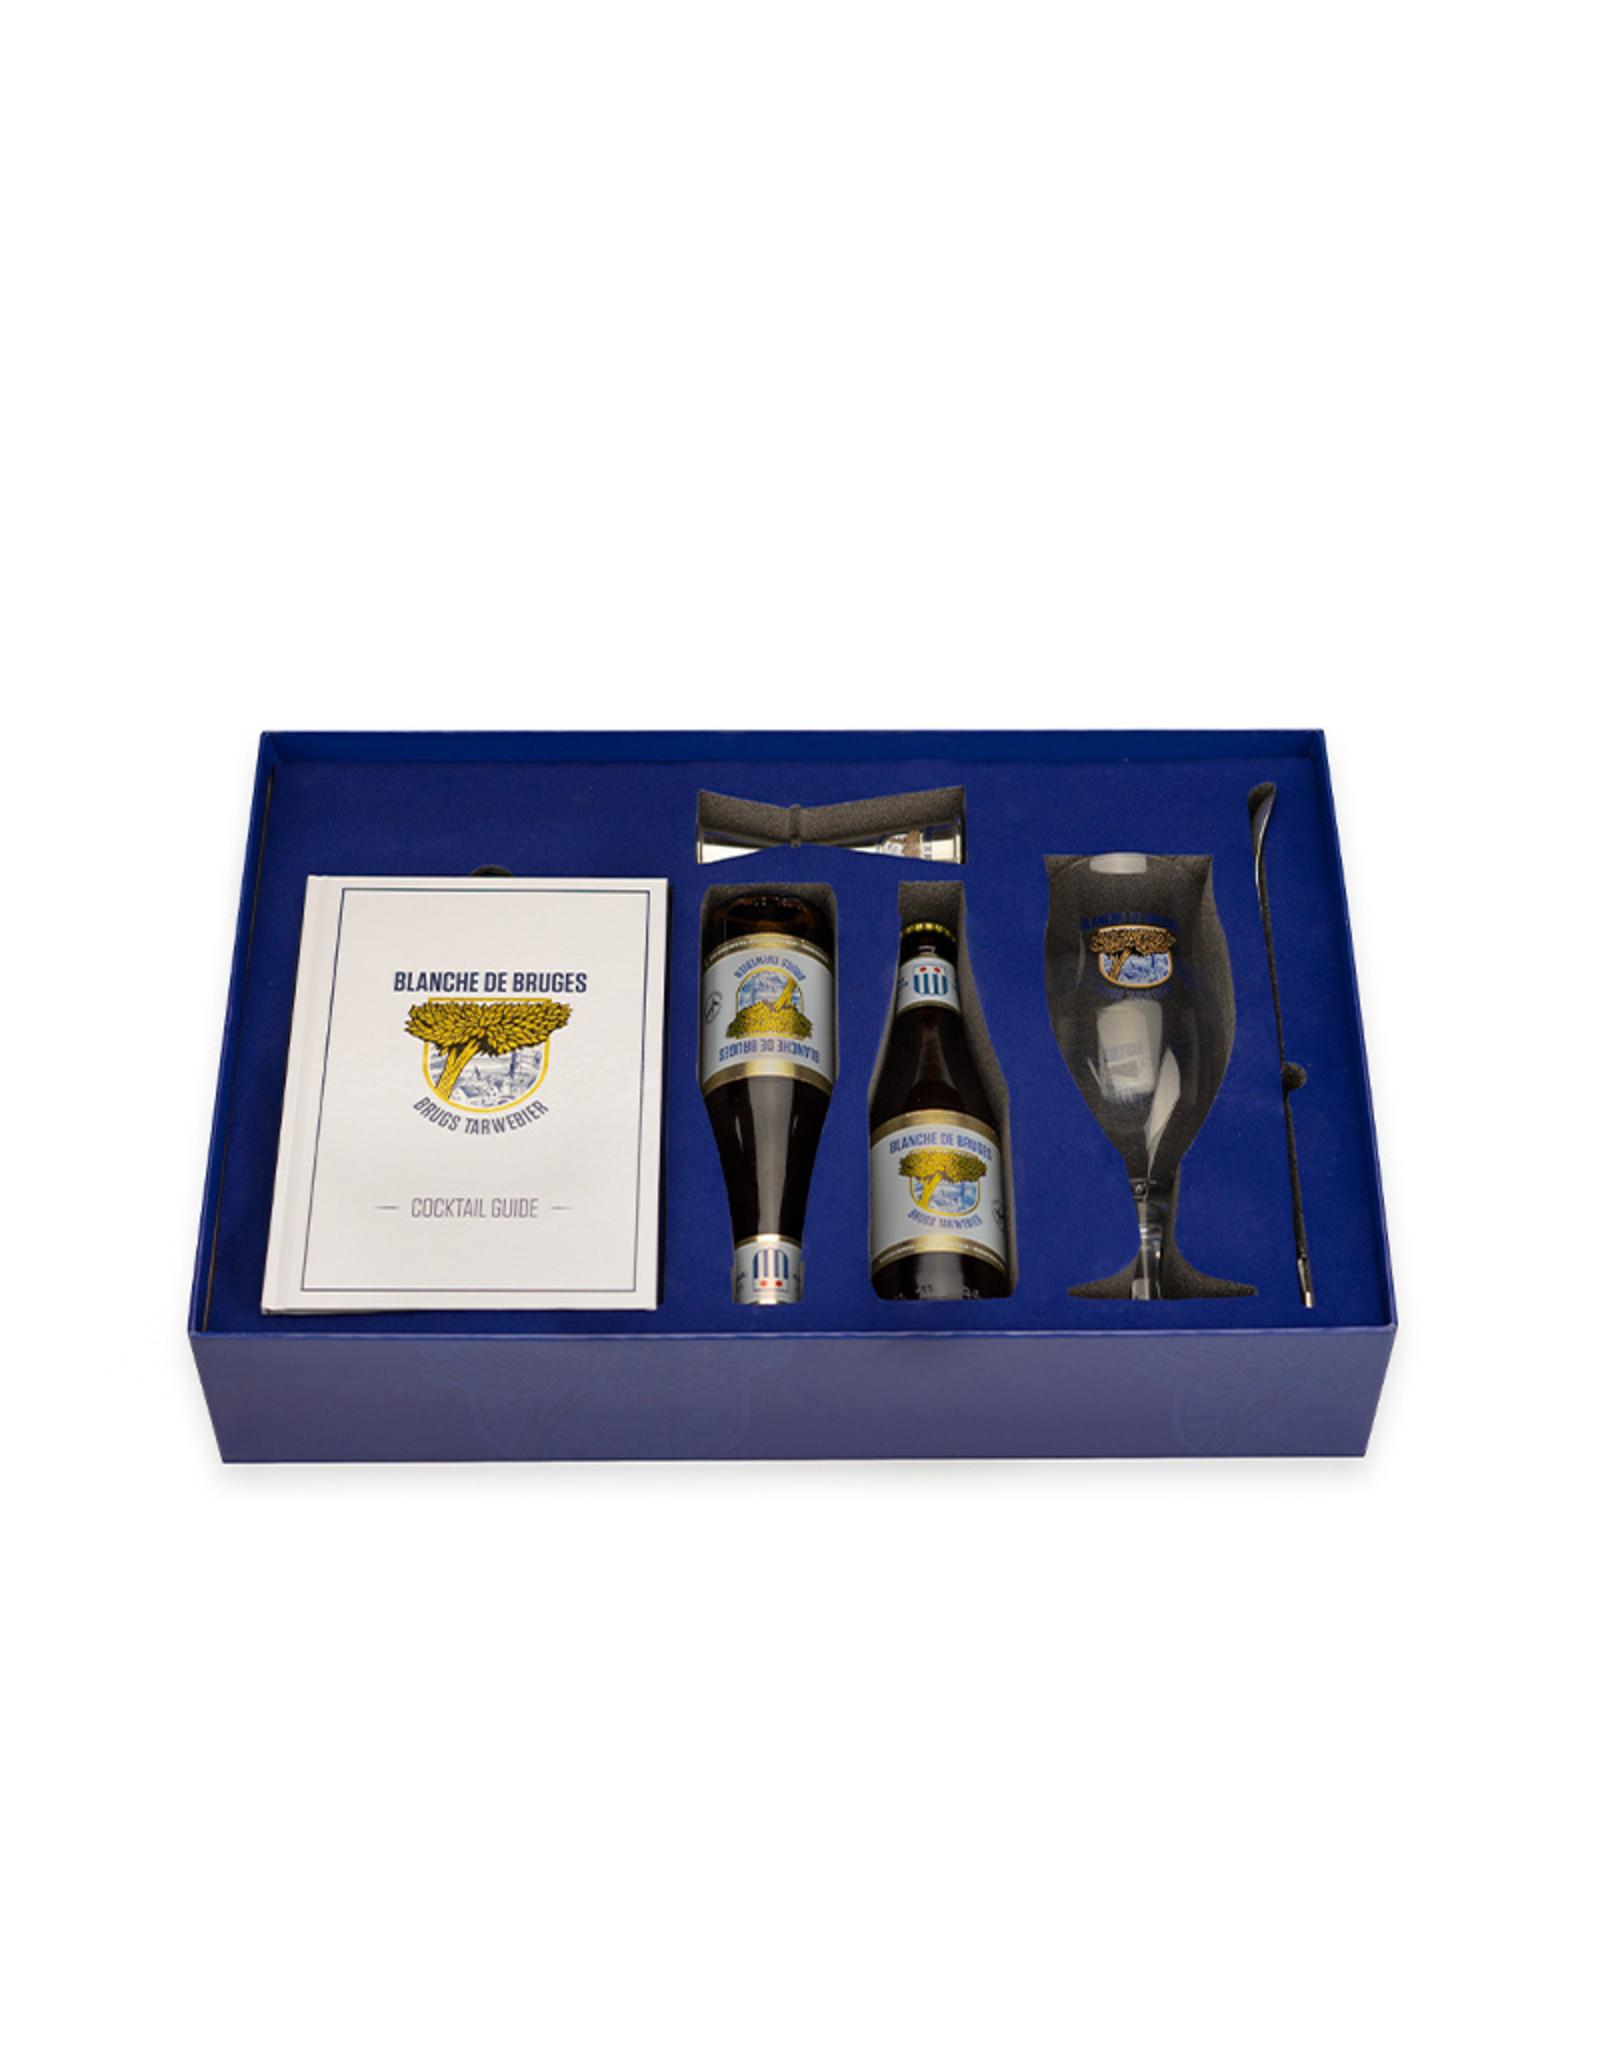 Brugs Tarwebier Blanche De Bruges cocktail box (Duch version)